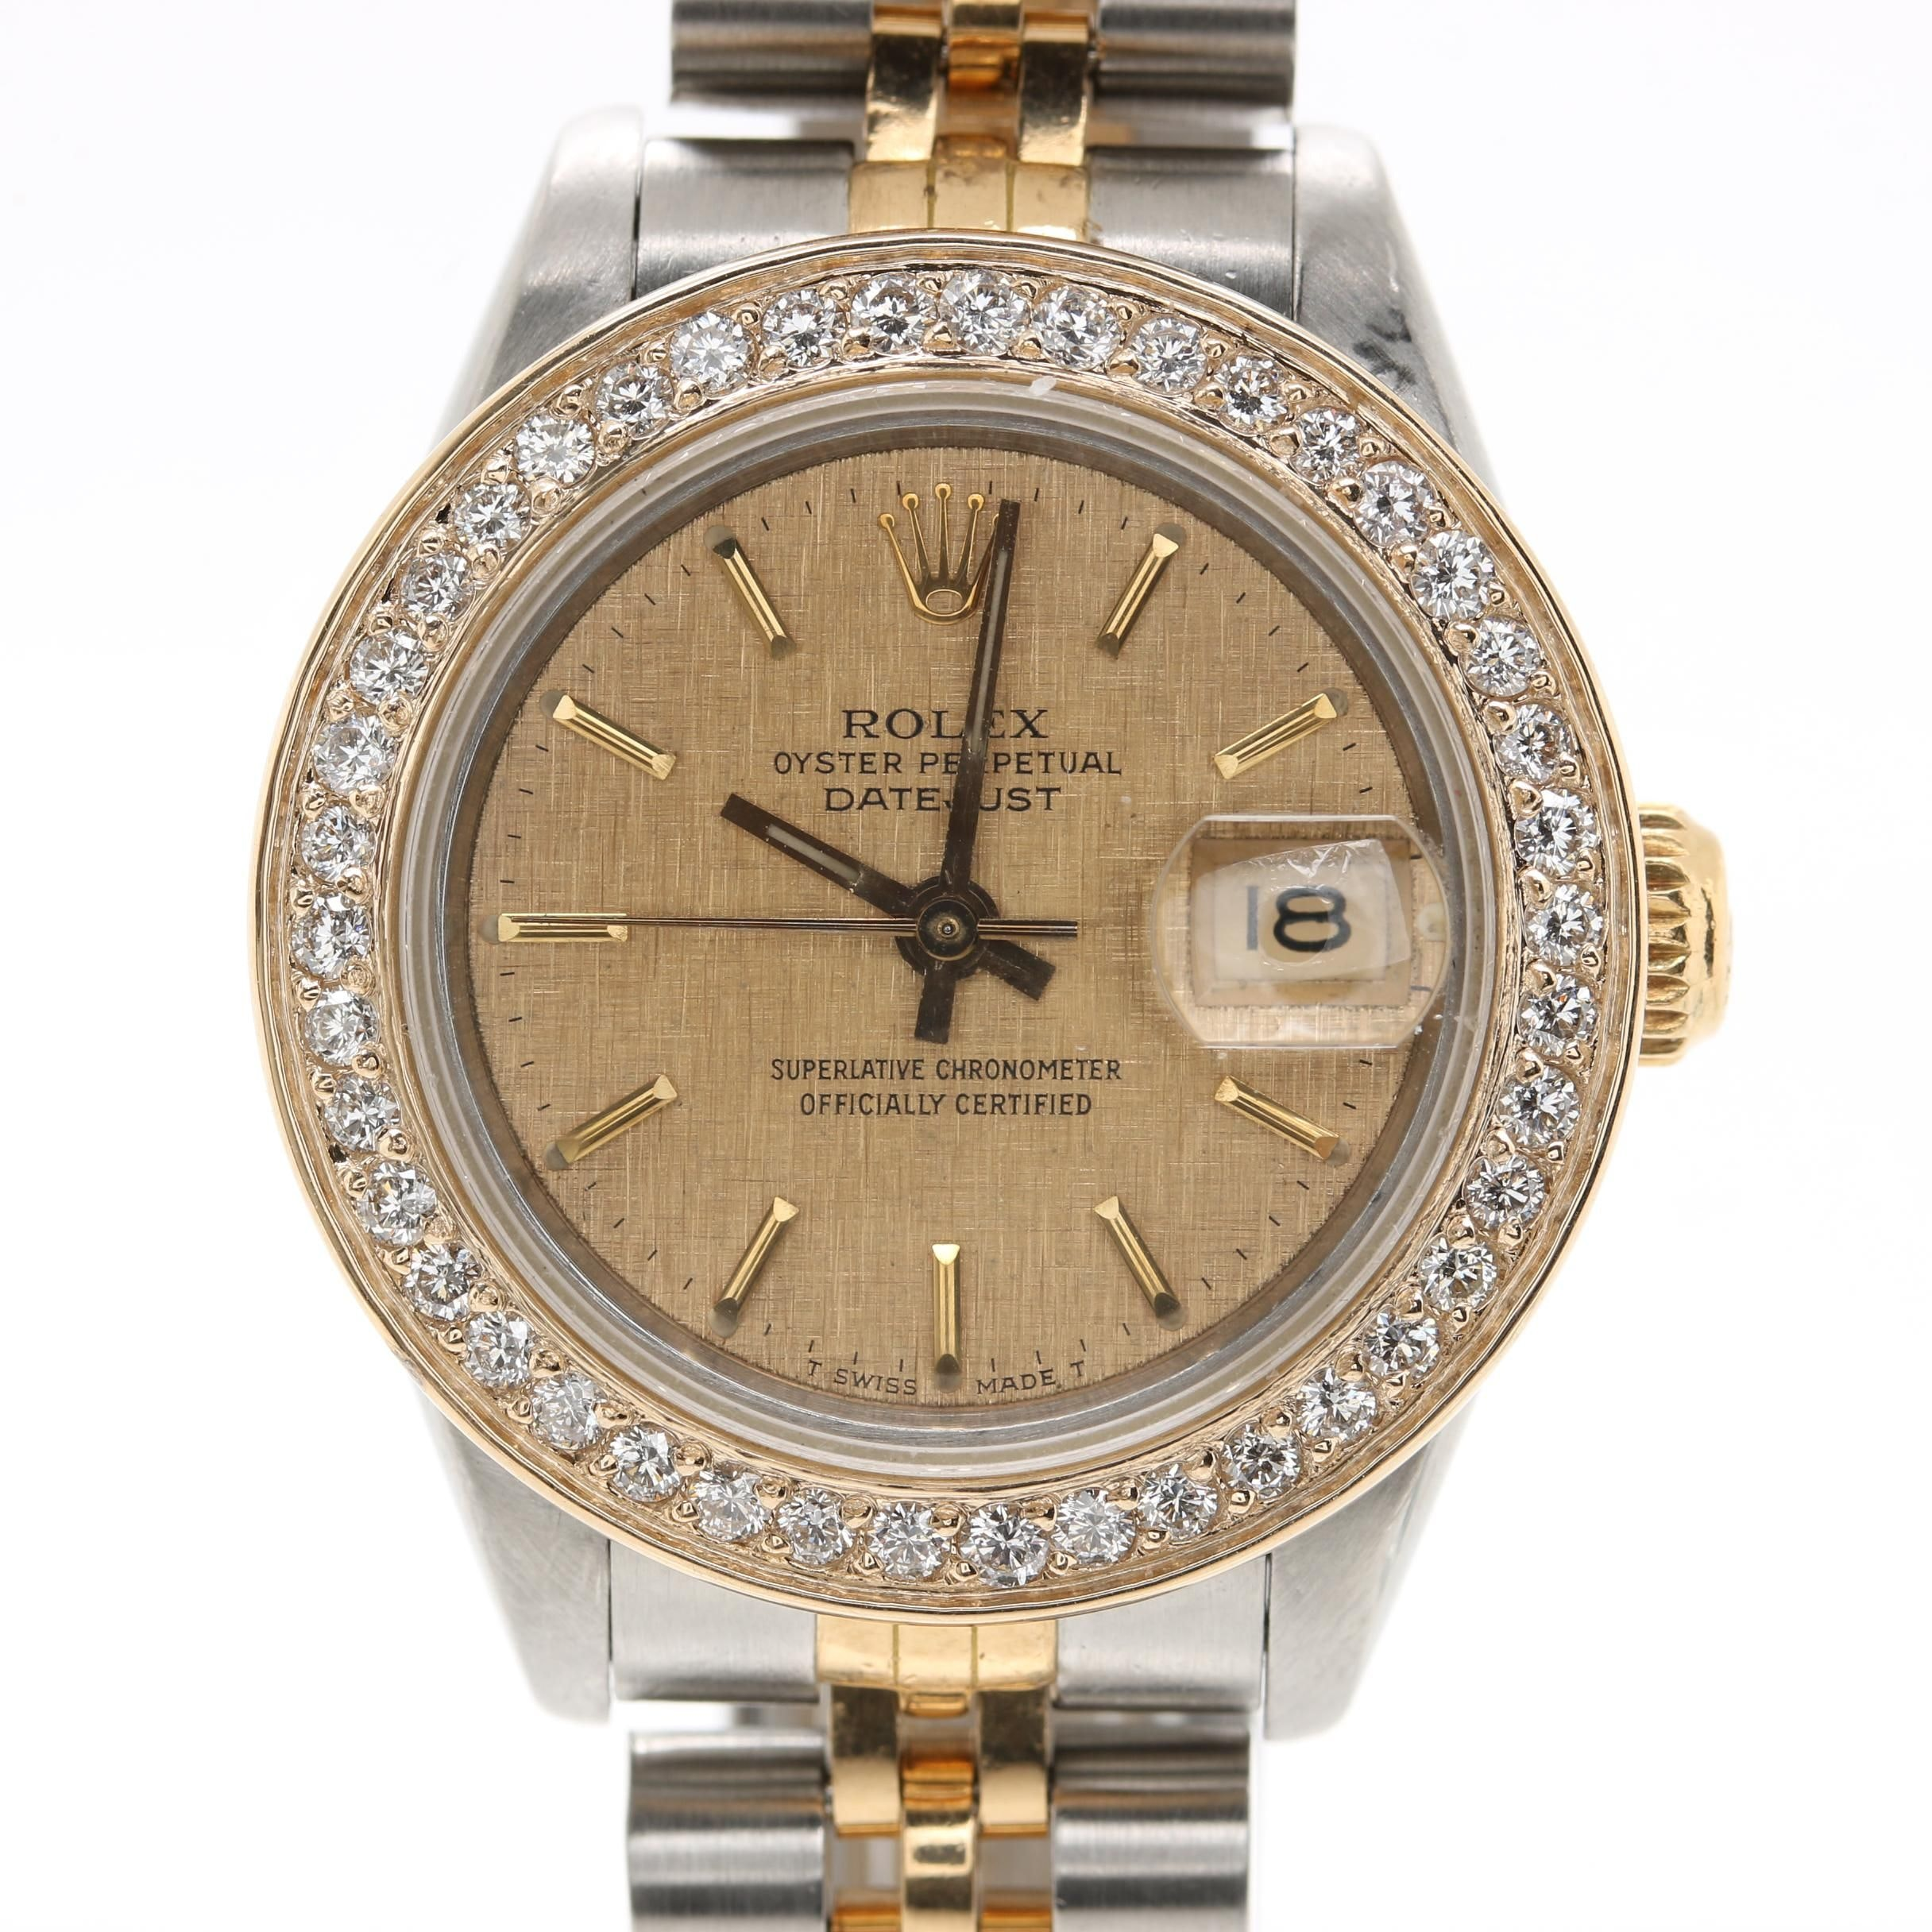 Circa 1987 Rolex Stainless Steel and 18K Yellow Gold Diamond Wristwatch